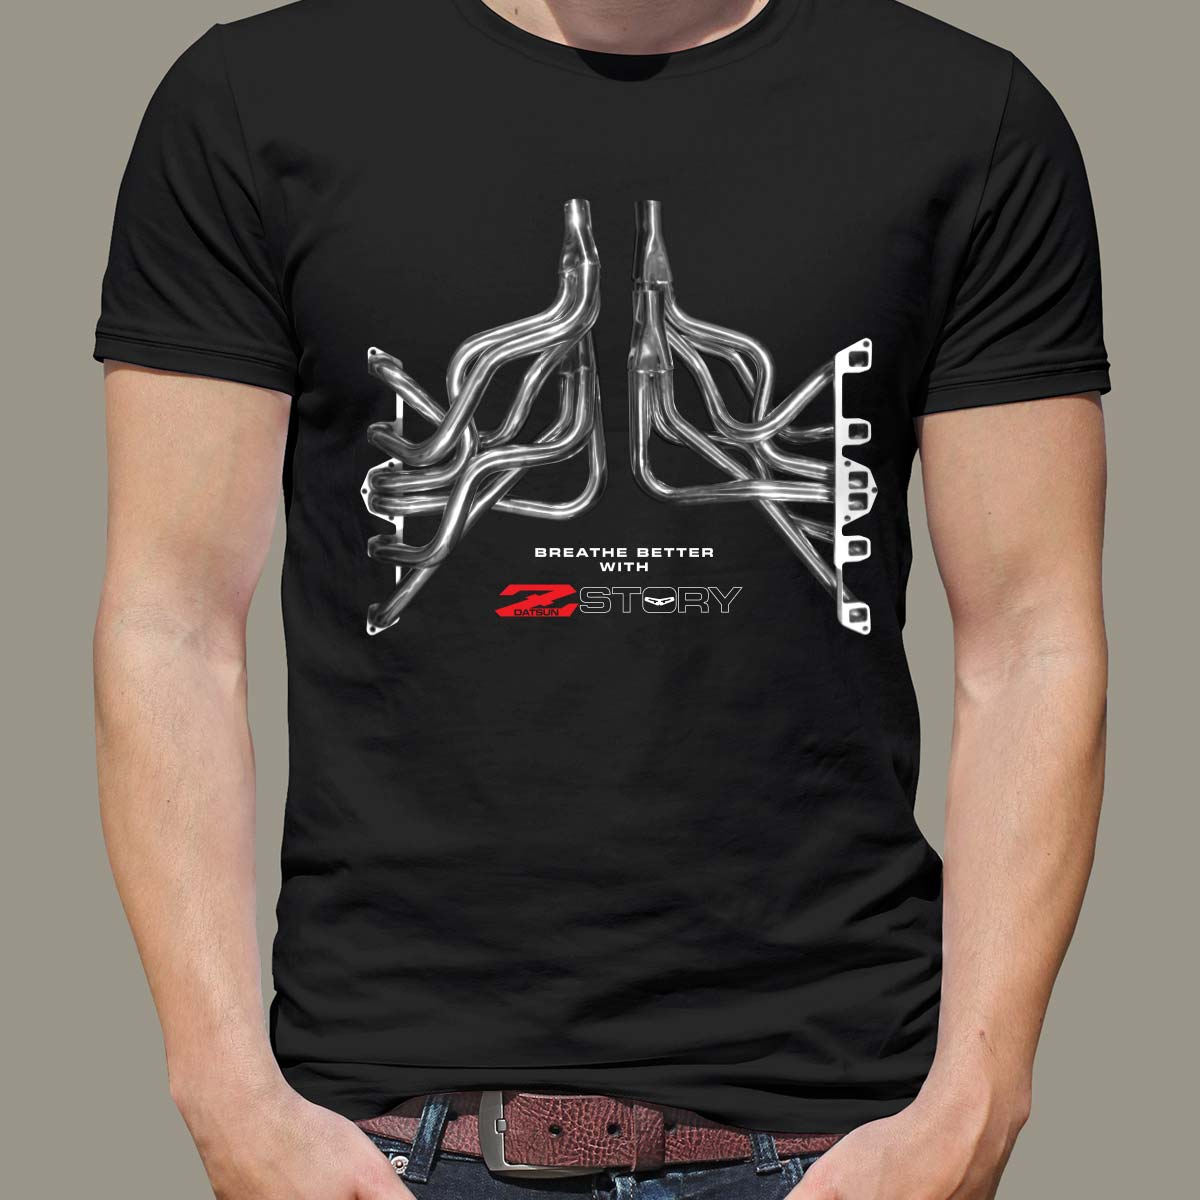 Exhaust branding - Intrepid Design Associates